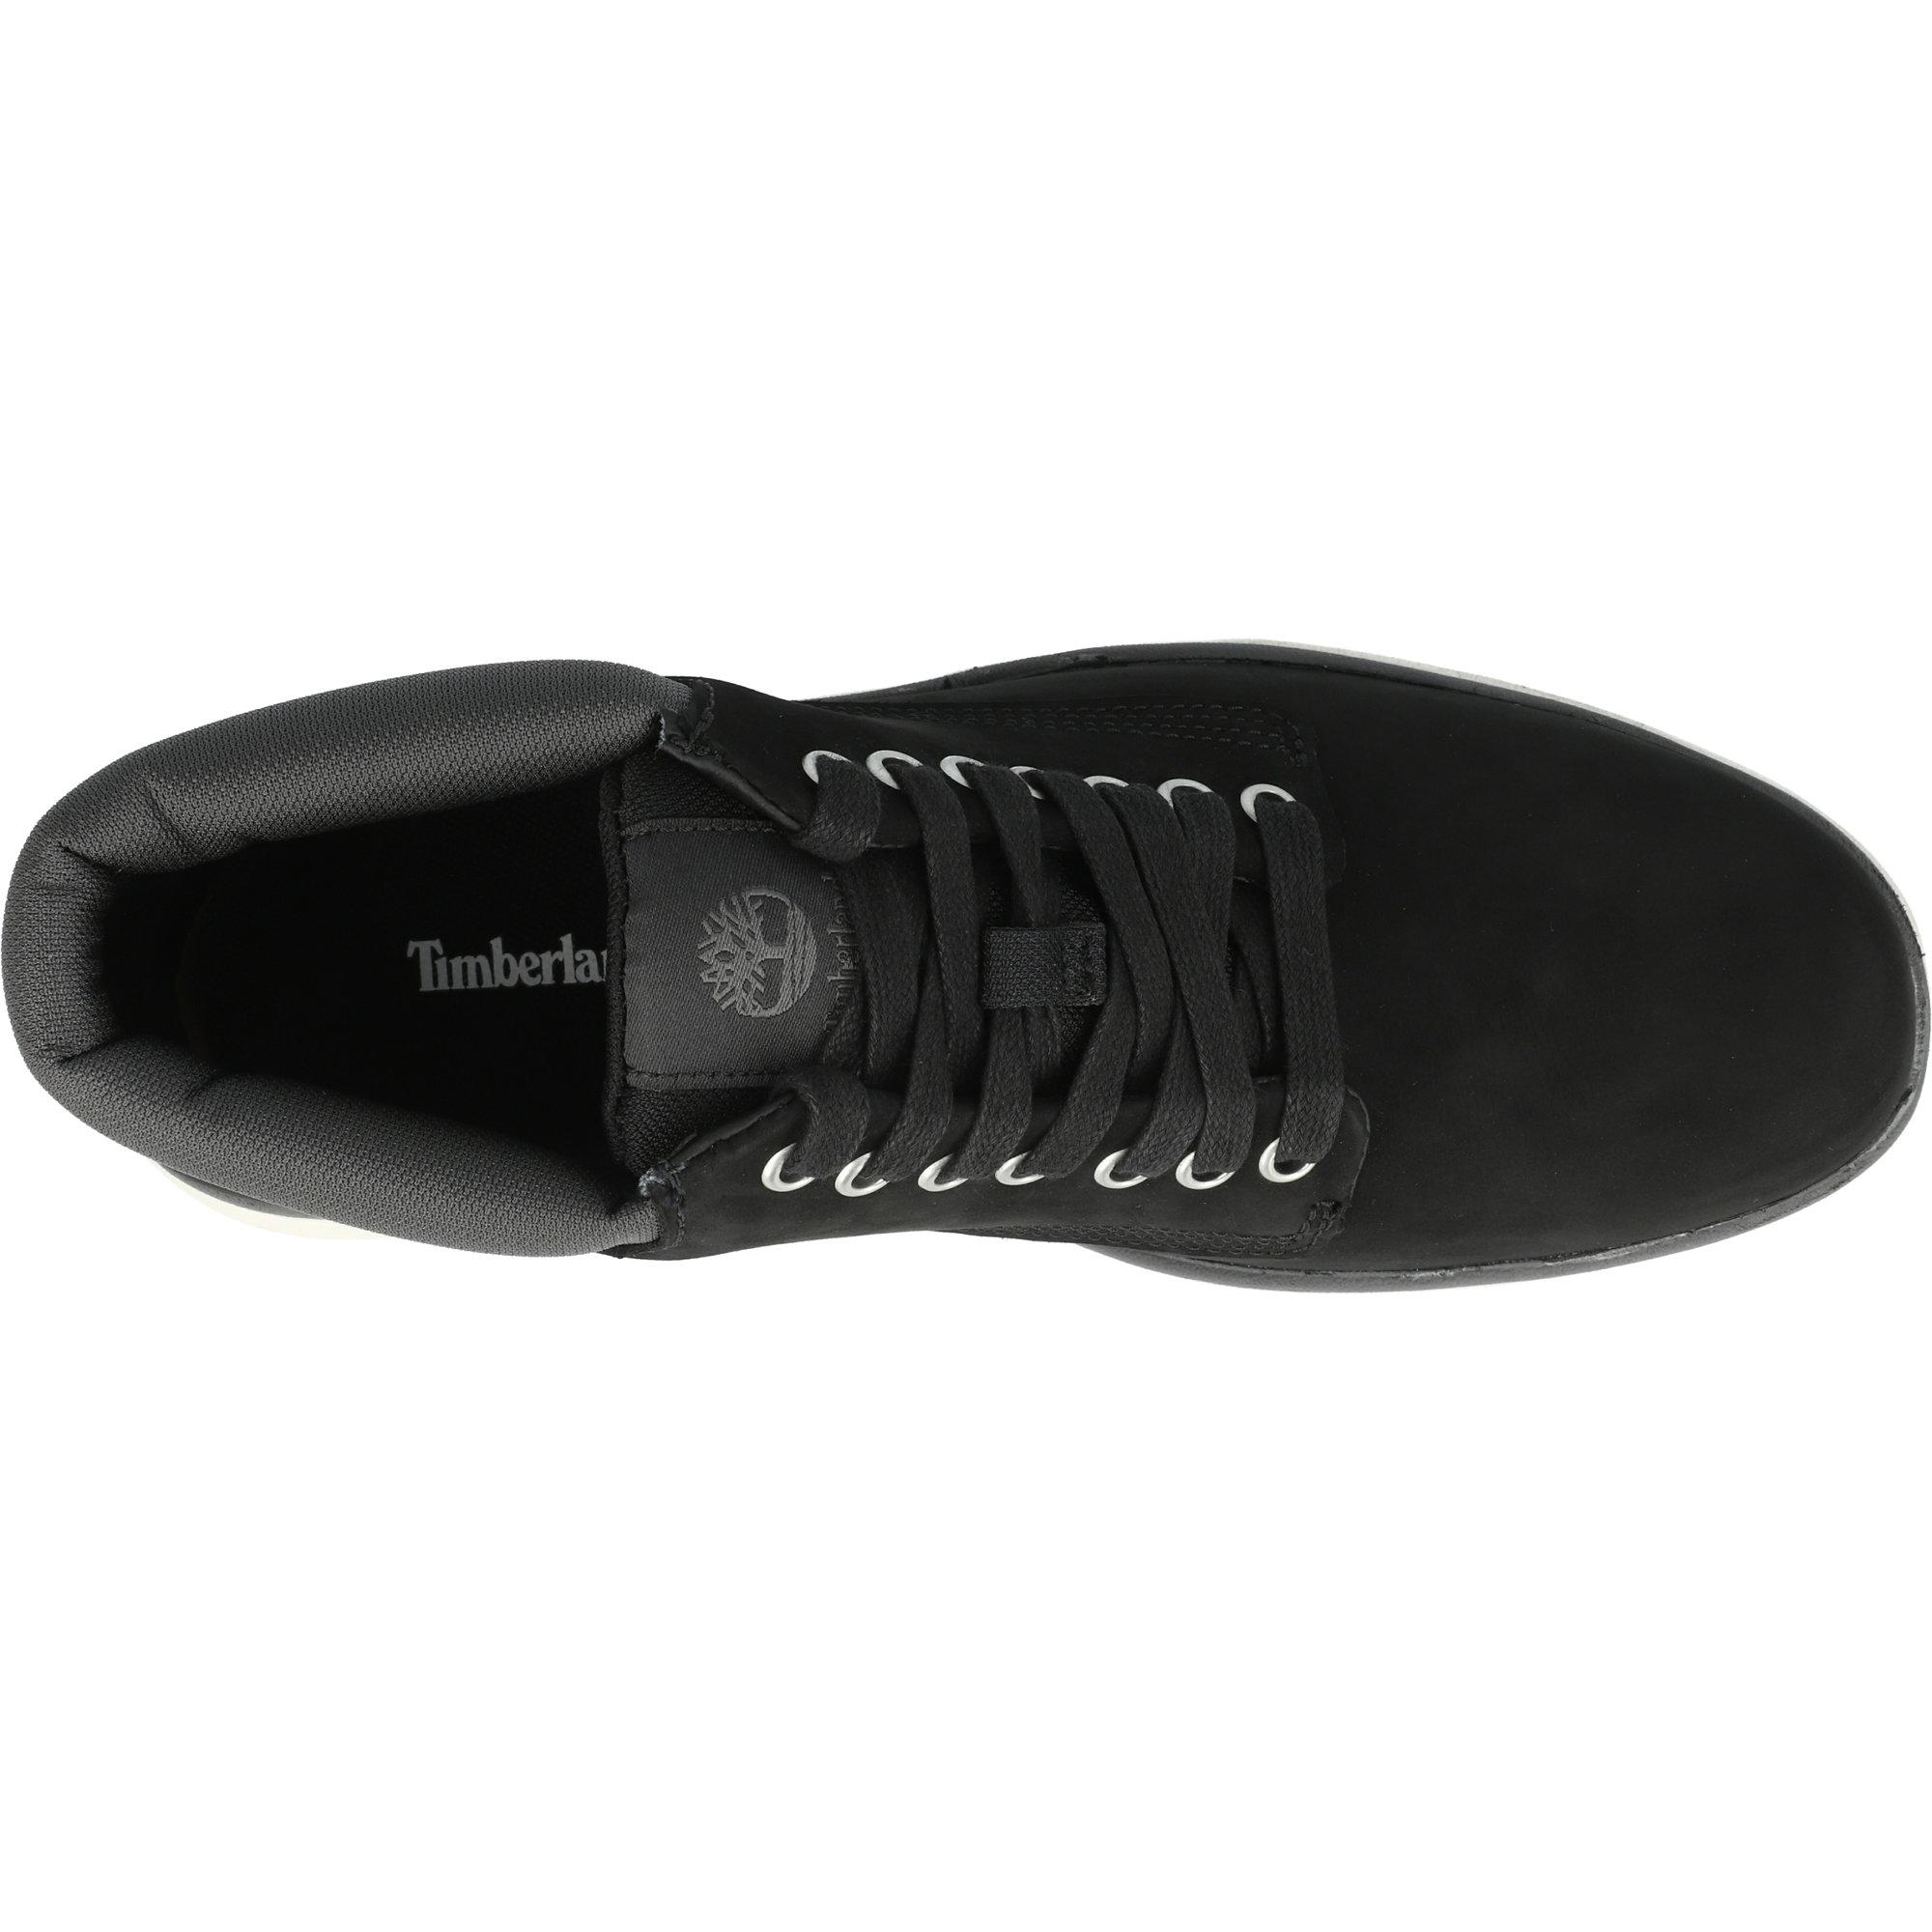 Timberland Bradstreet Leather Chukka Black Nubuck